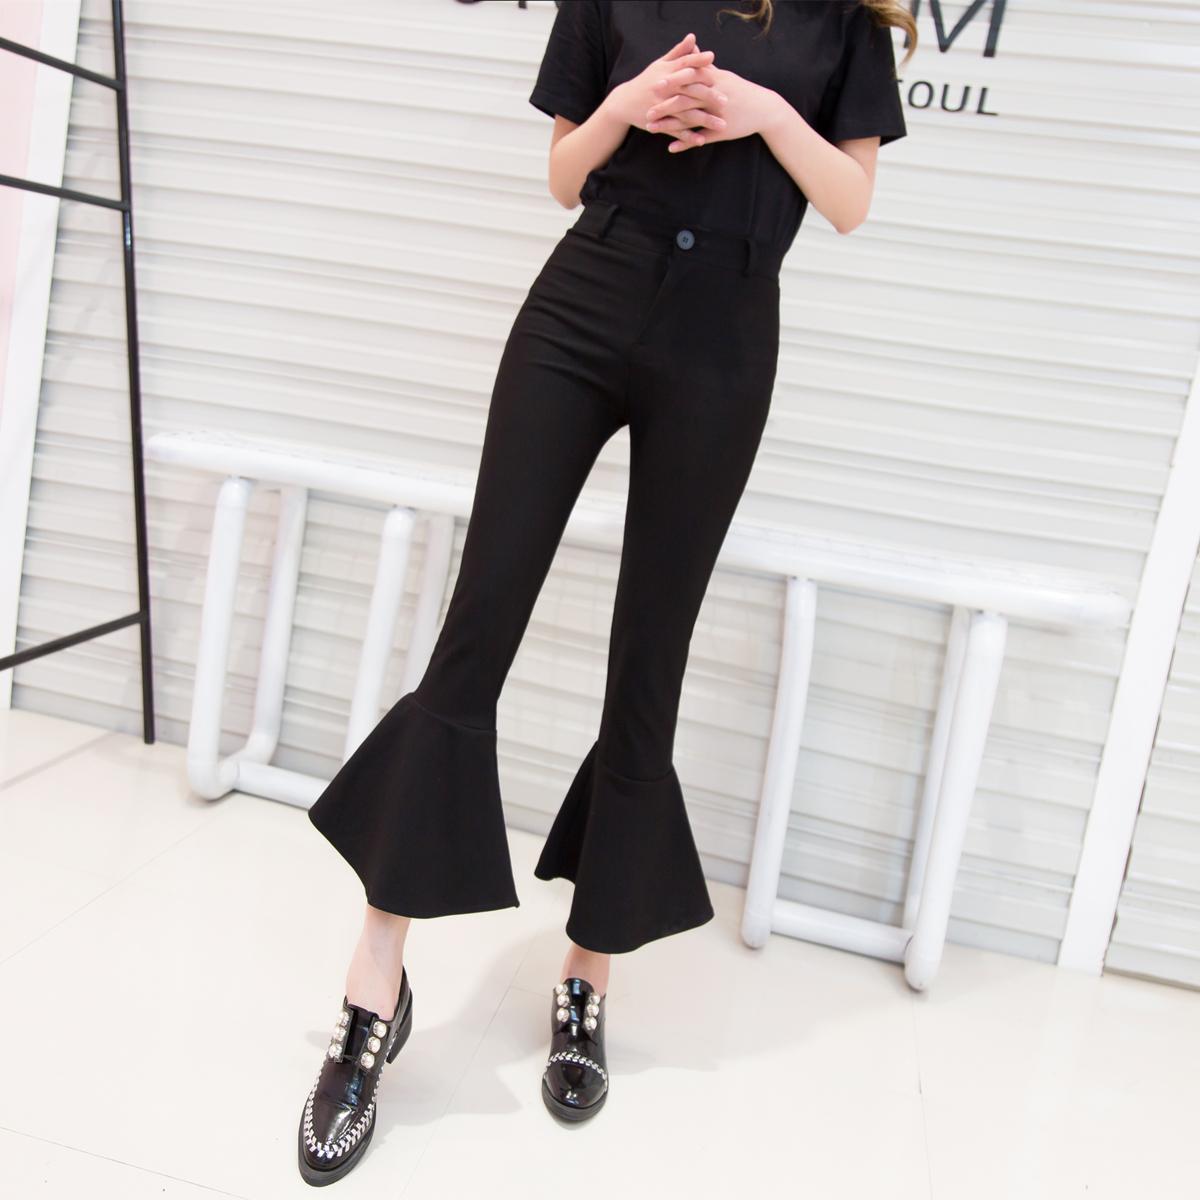 Fishtail pants women 2020 new flounced large size wide leg slim spring autumn Korean elastic micro flared pants 9 points